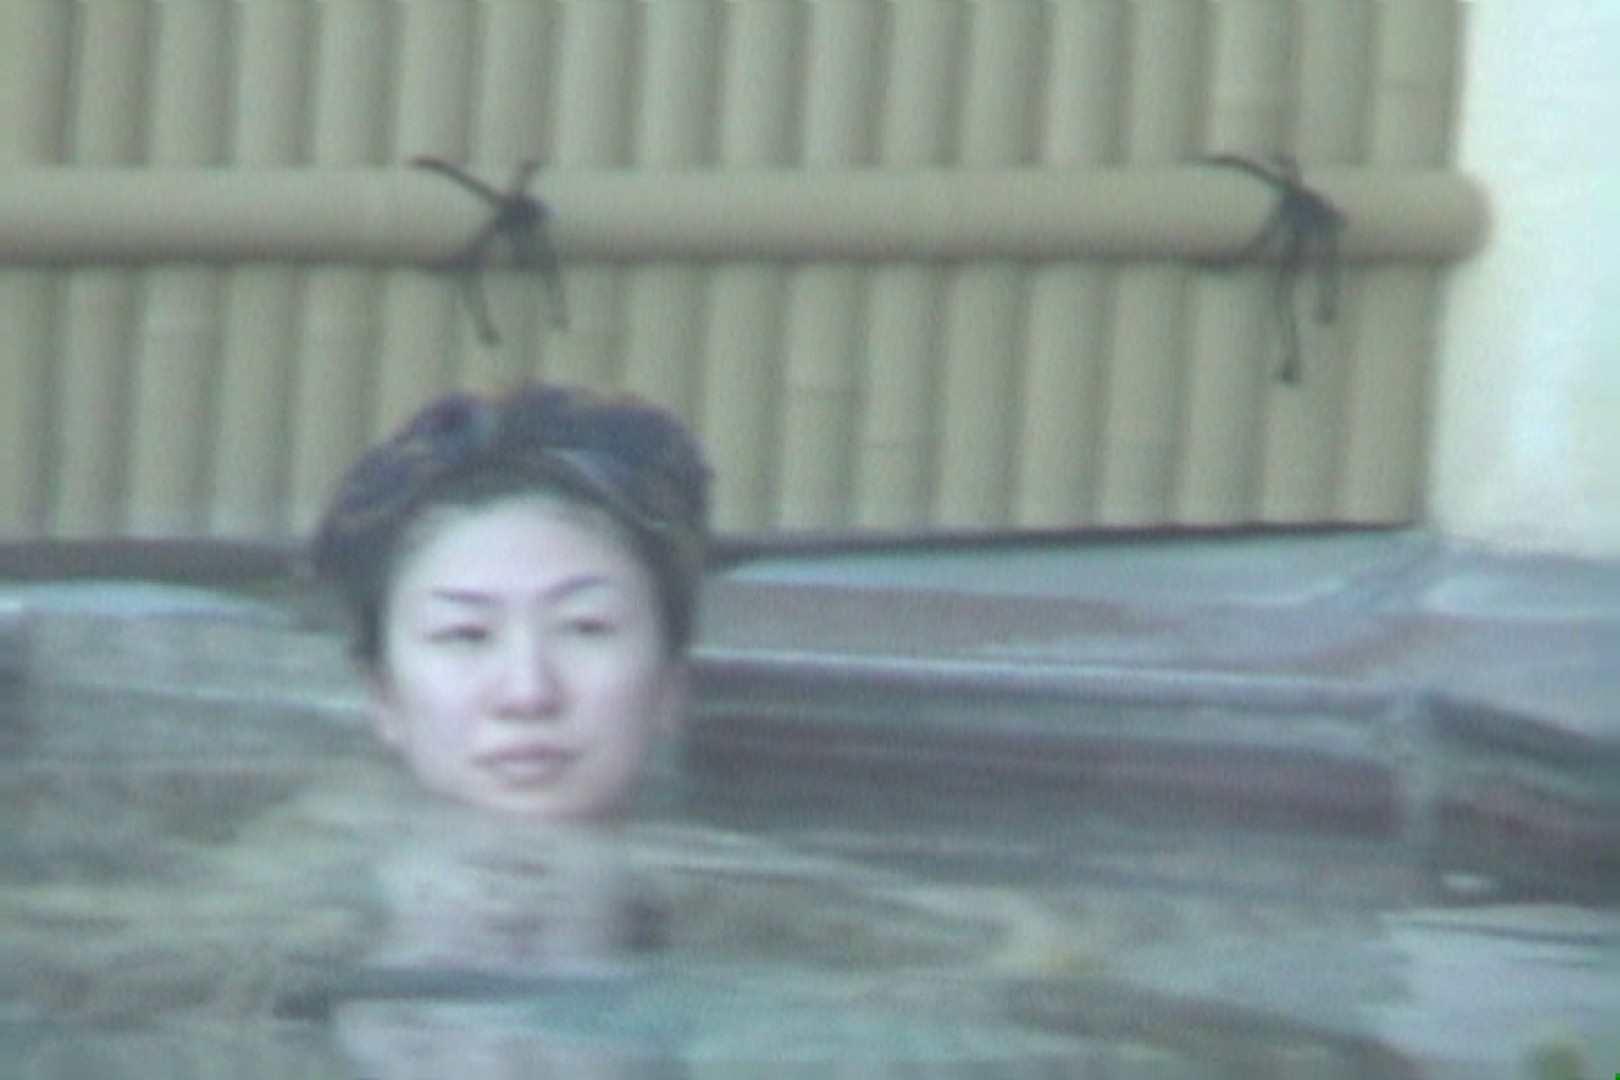 Aquaな露天風呂Vol.607 盗撮シリーズ | 露天風呂編  107PIX 25